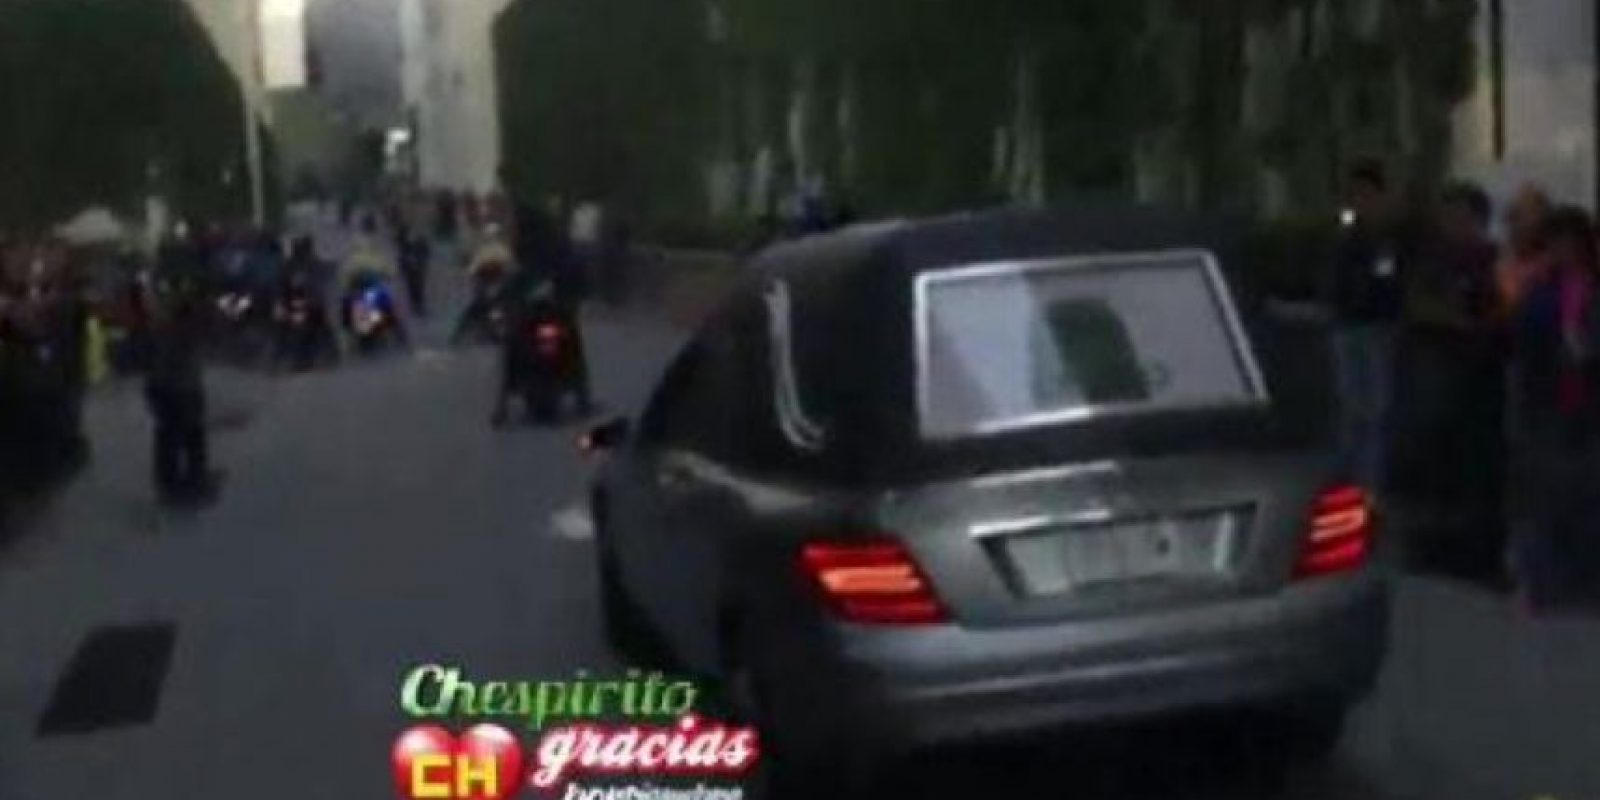 Varios medios registraron su llegada. Foto:Twitter/TelevisaTvMx